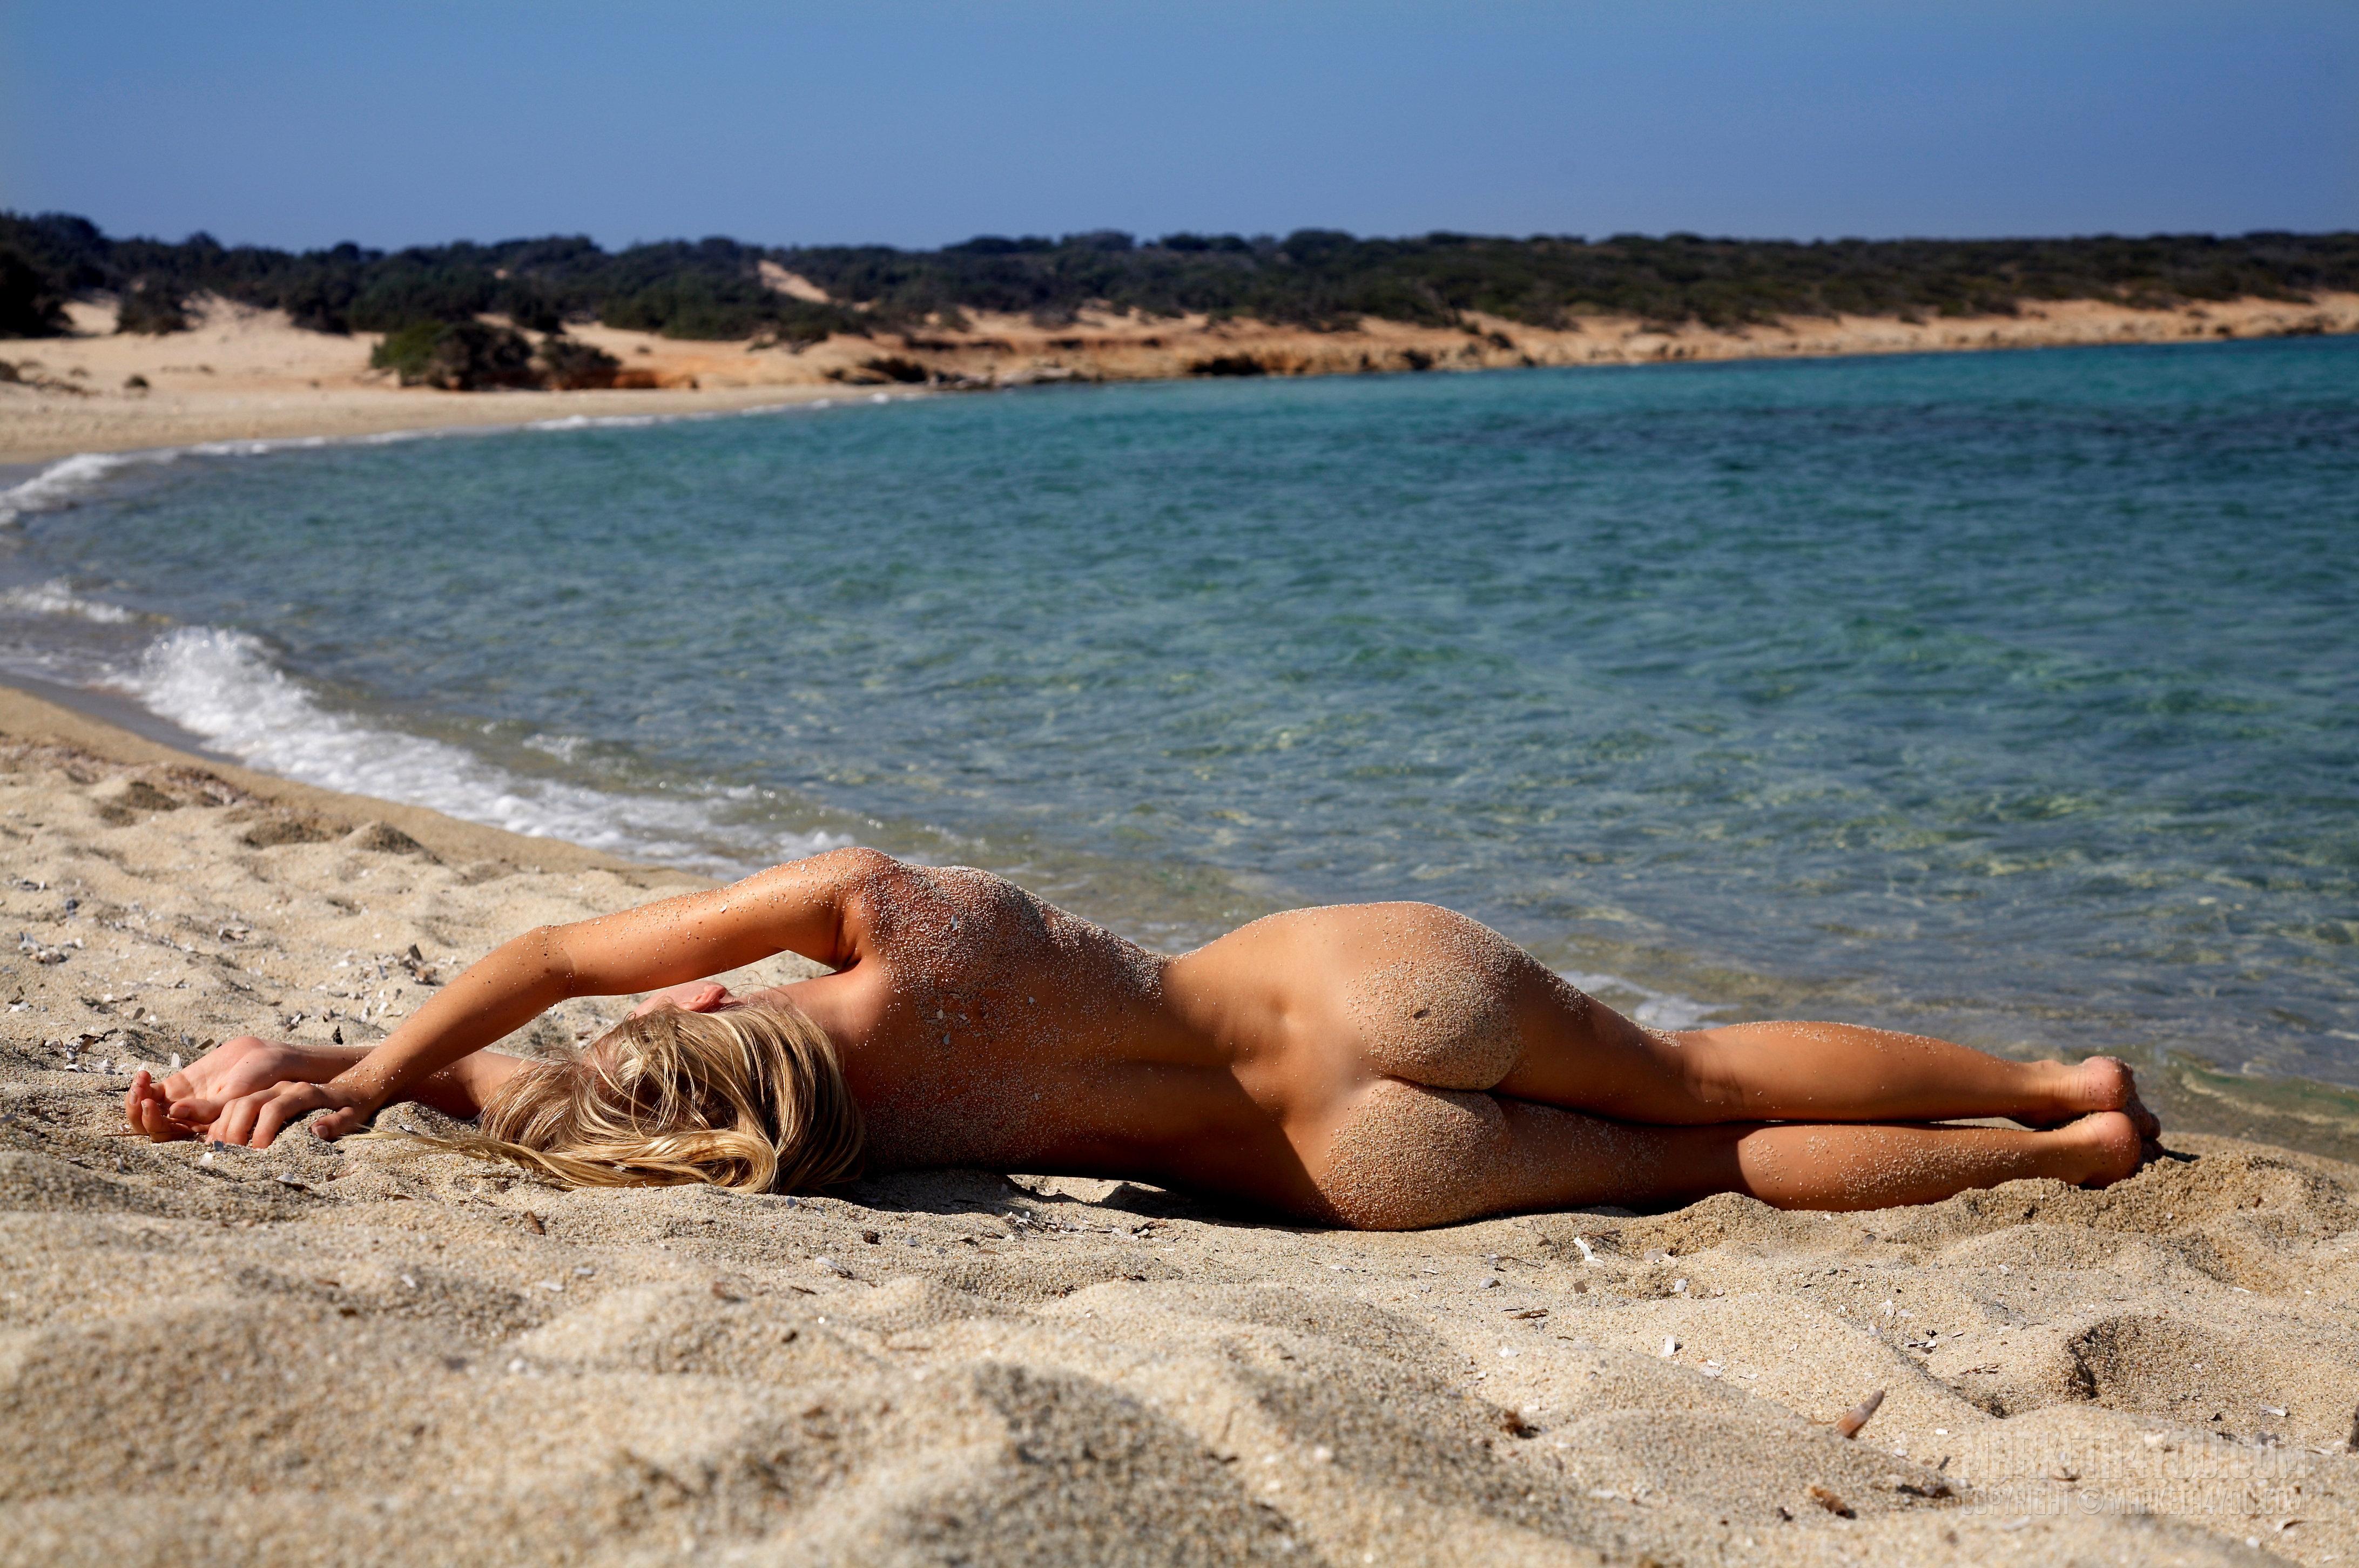 Эротика на пляжже 4 фотография